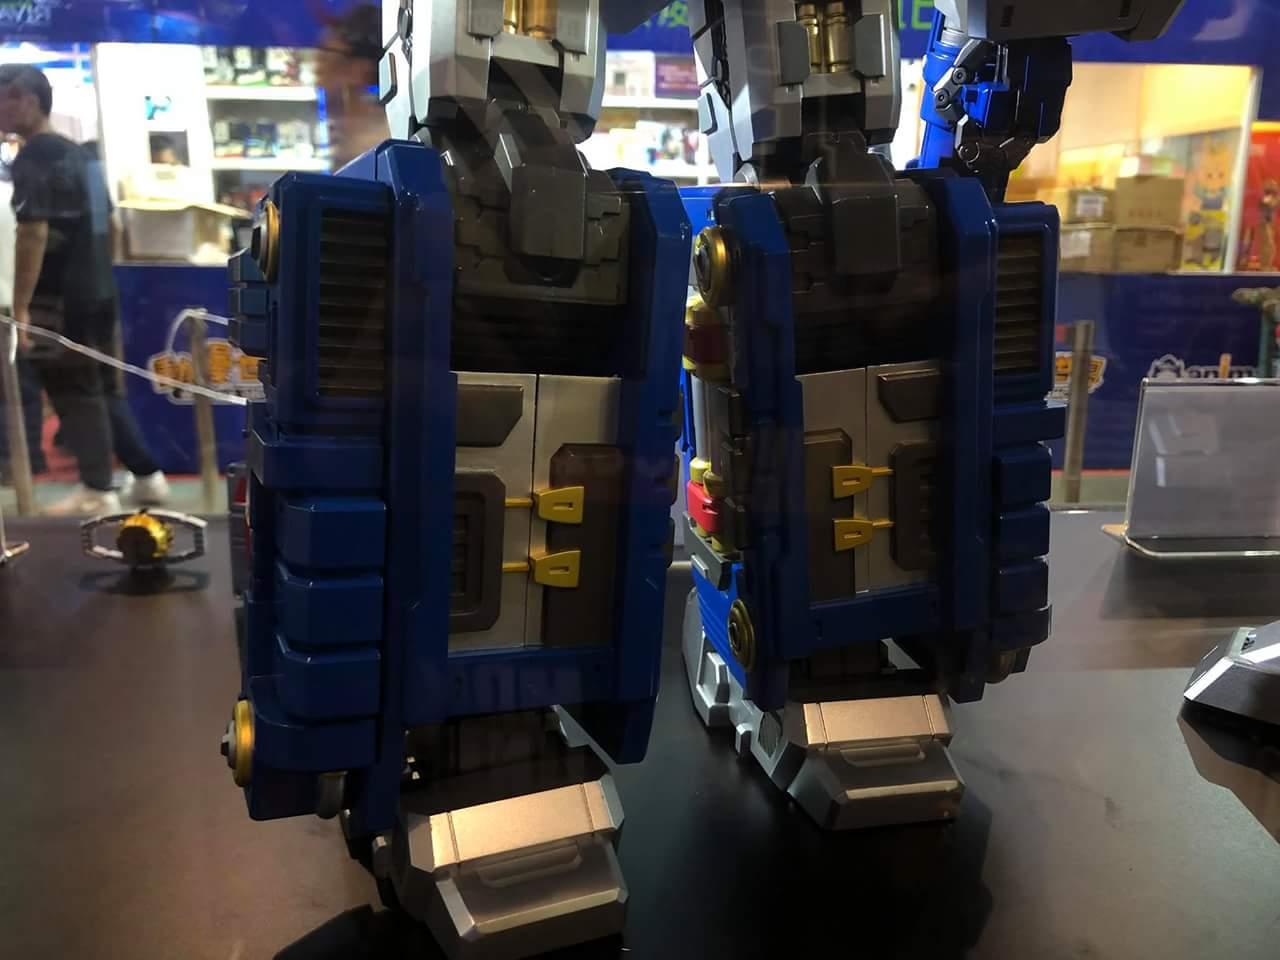 Figurines Transformers G1 (articulé, non transformable) ― Par 3A, Action Toys, Fewture, Toys Alliance, Sentinel, Kotobukiya, Kids Logic, Herocross, EX Gokin, etc - Page 6 BHXuSJle_o